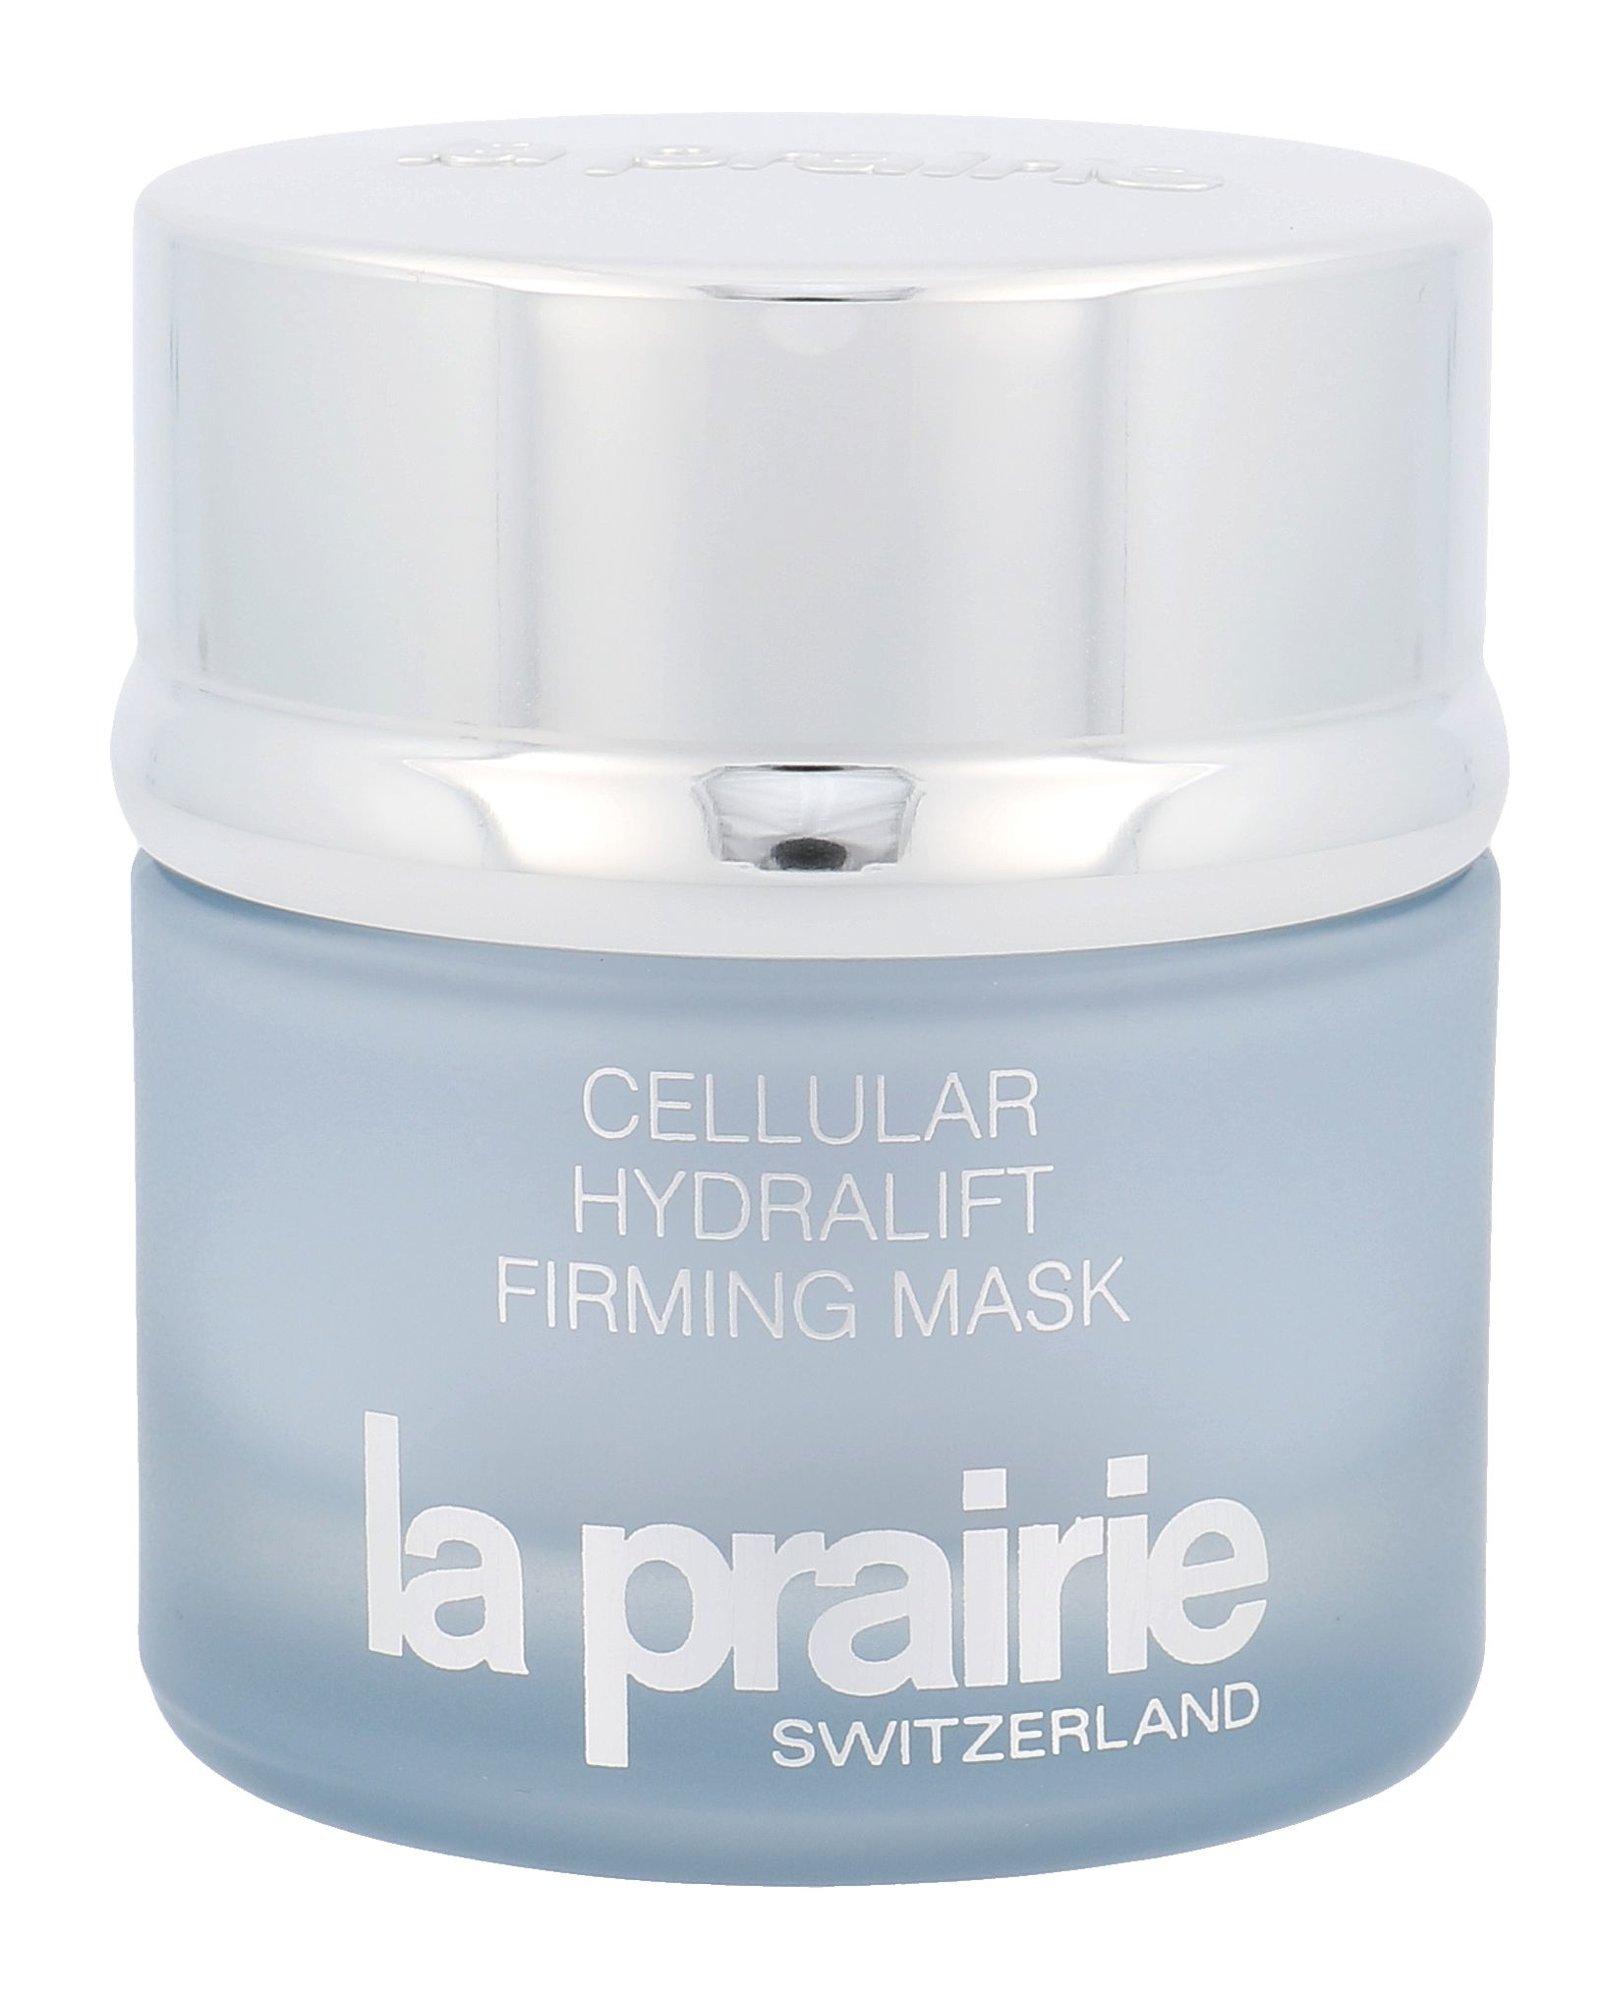 La Prairie Cellular Face Mask 50ml  Hydralift Firming Mask